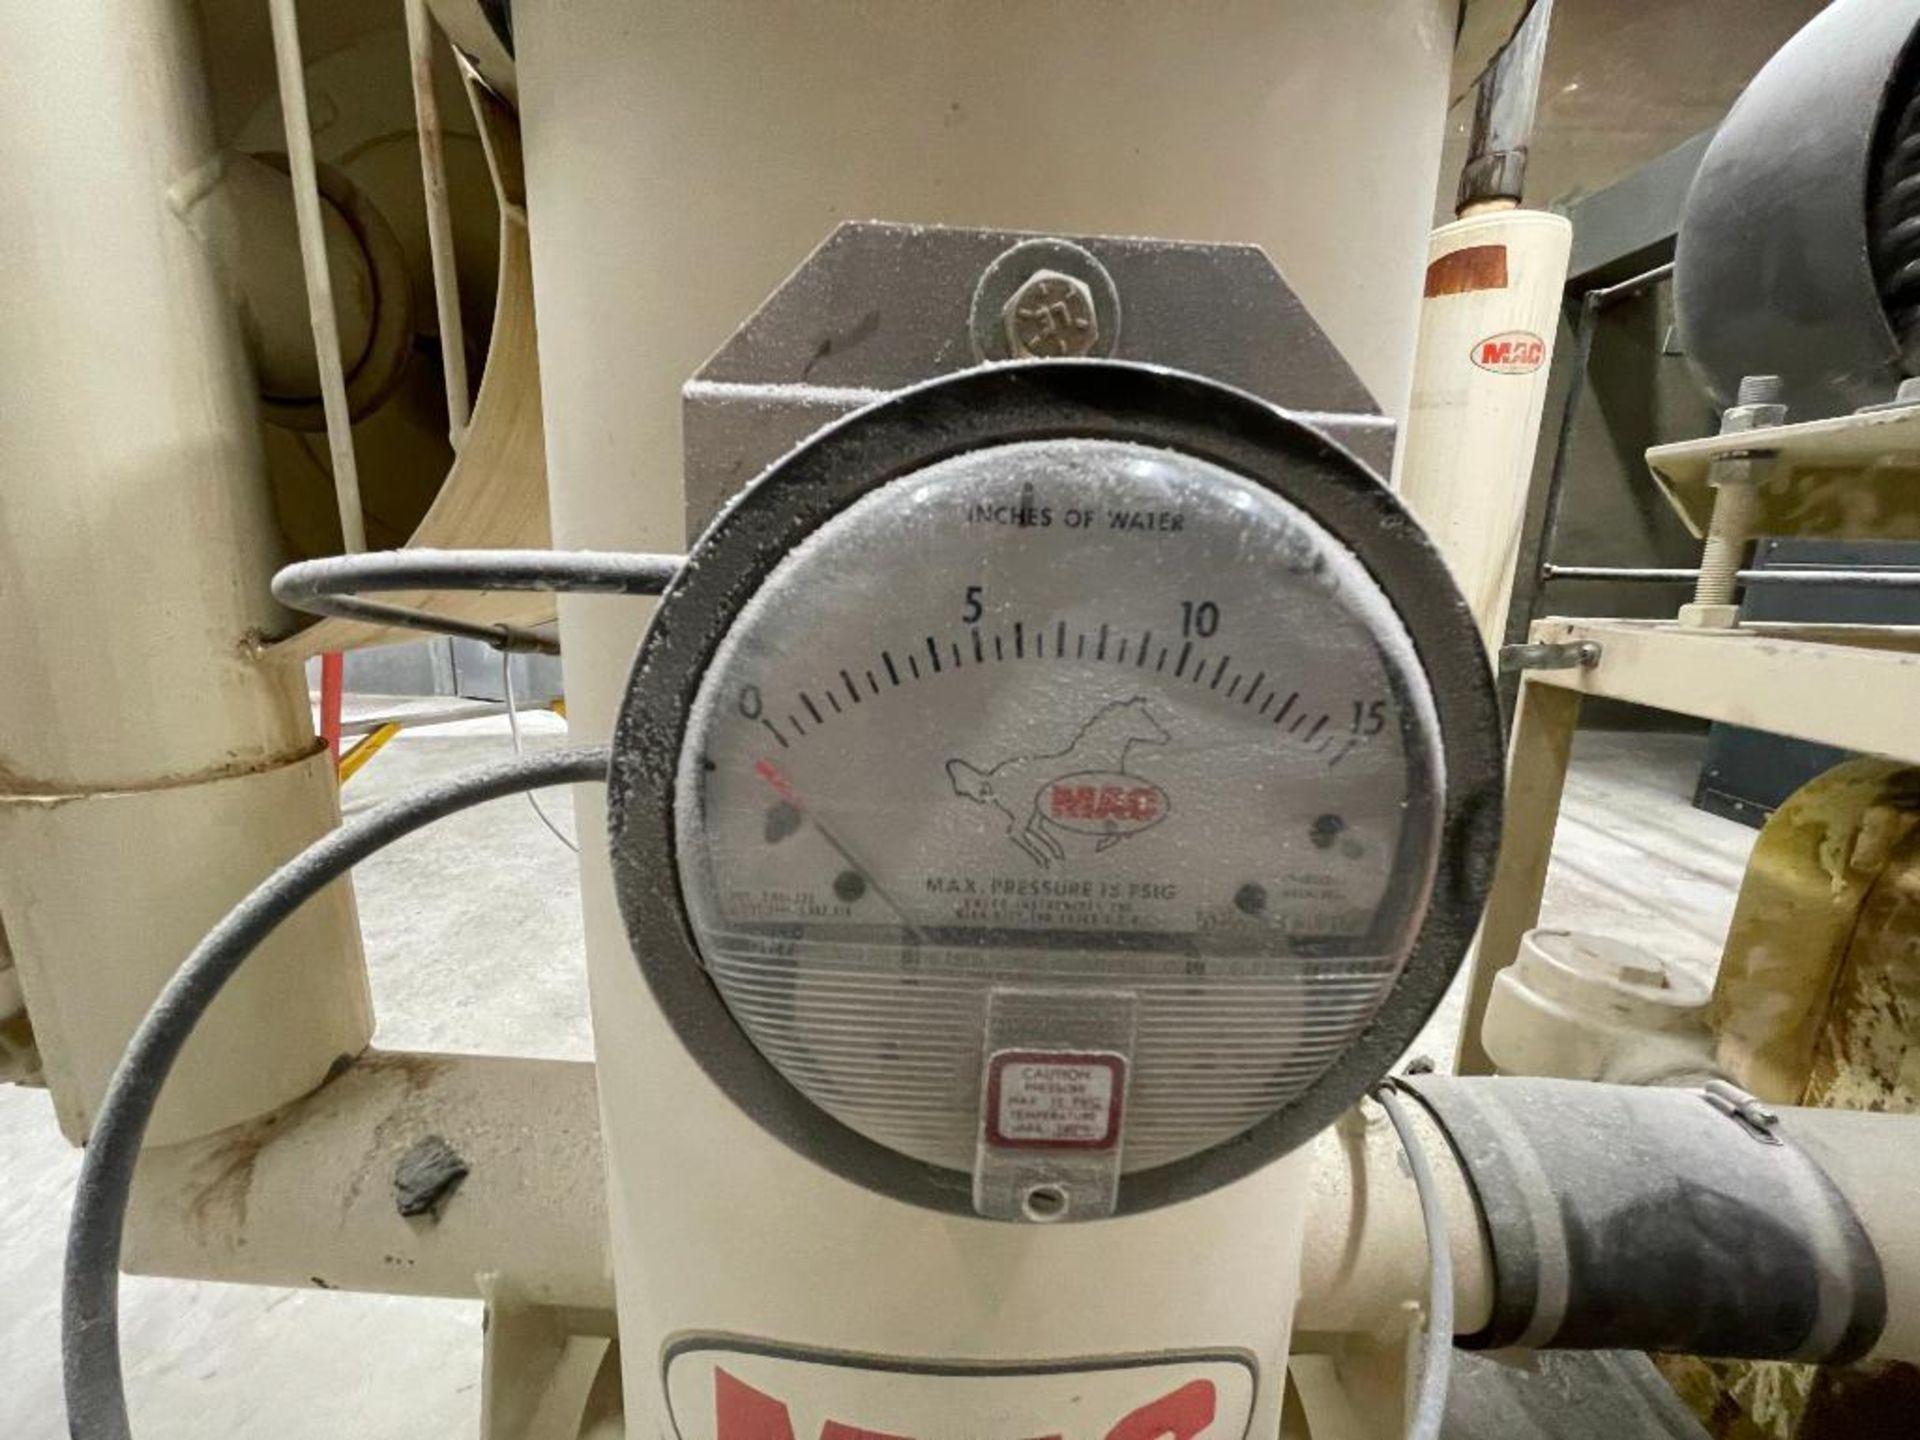 Sutorbilt rotary positive blower - Image 17 of 21